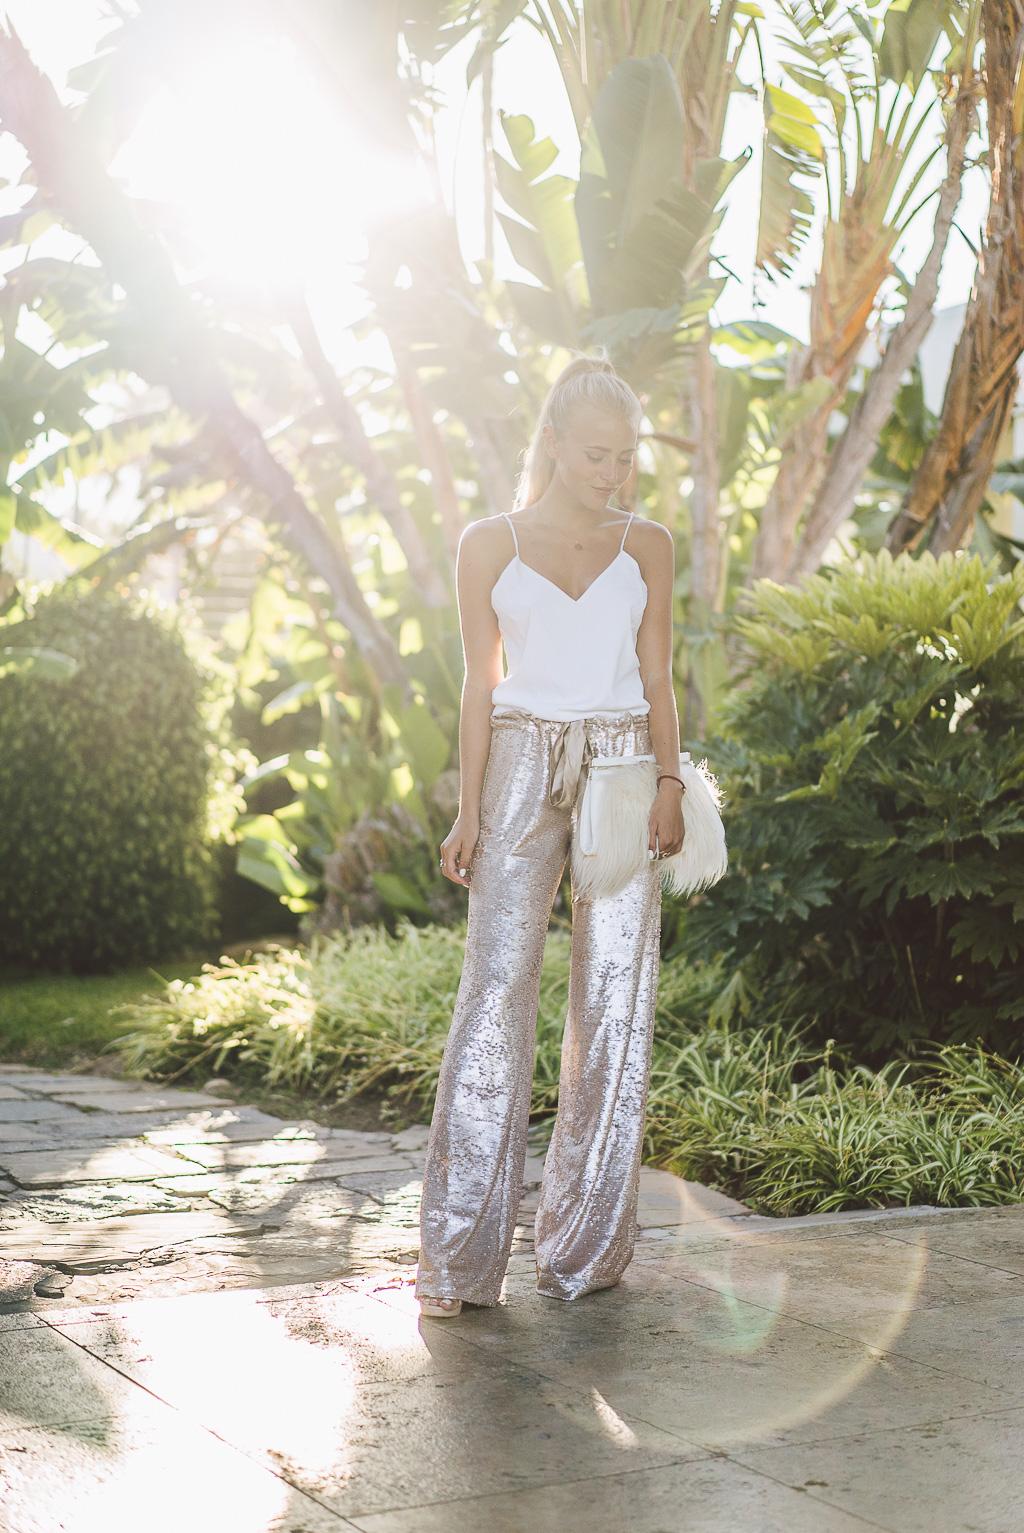 janni-deler-shiny-trousers-bymalinasDSC03622